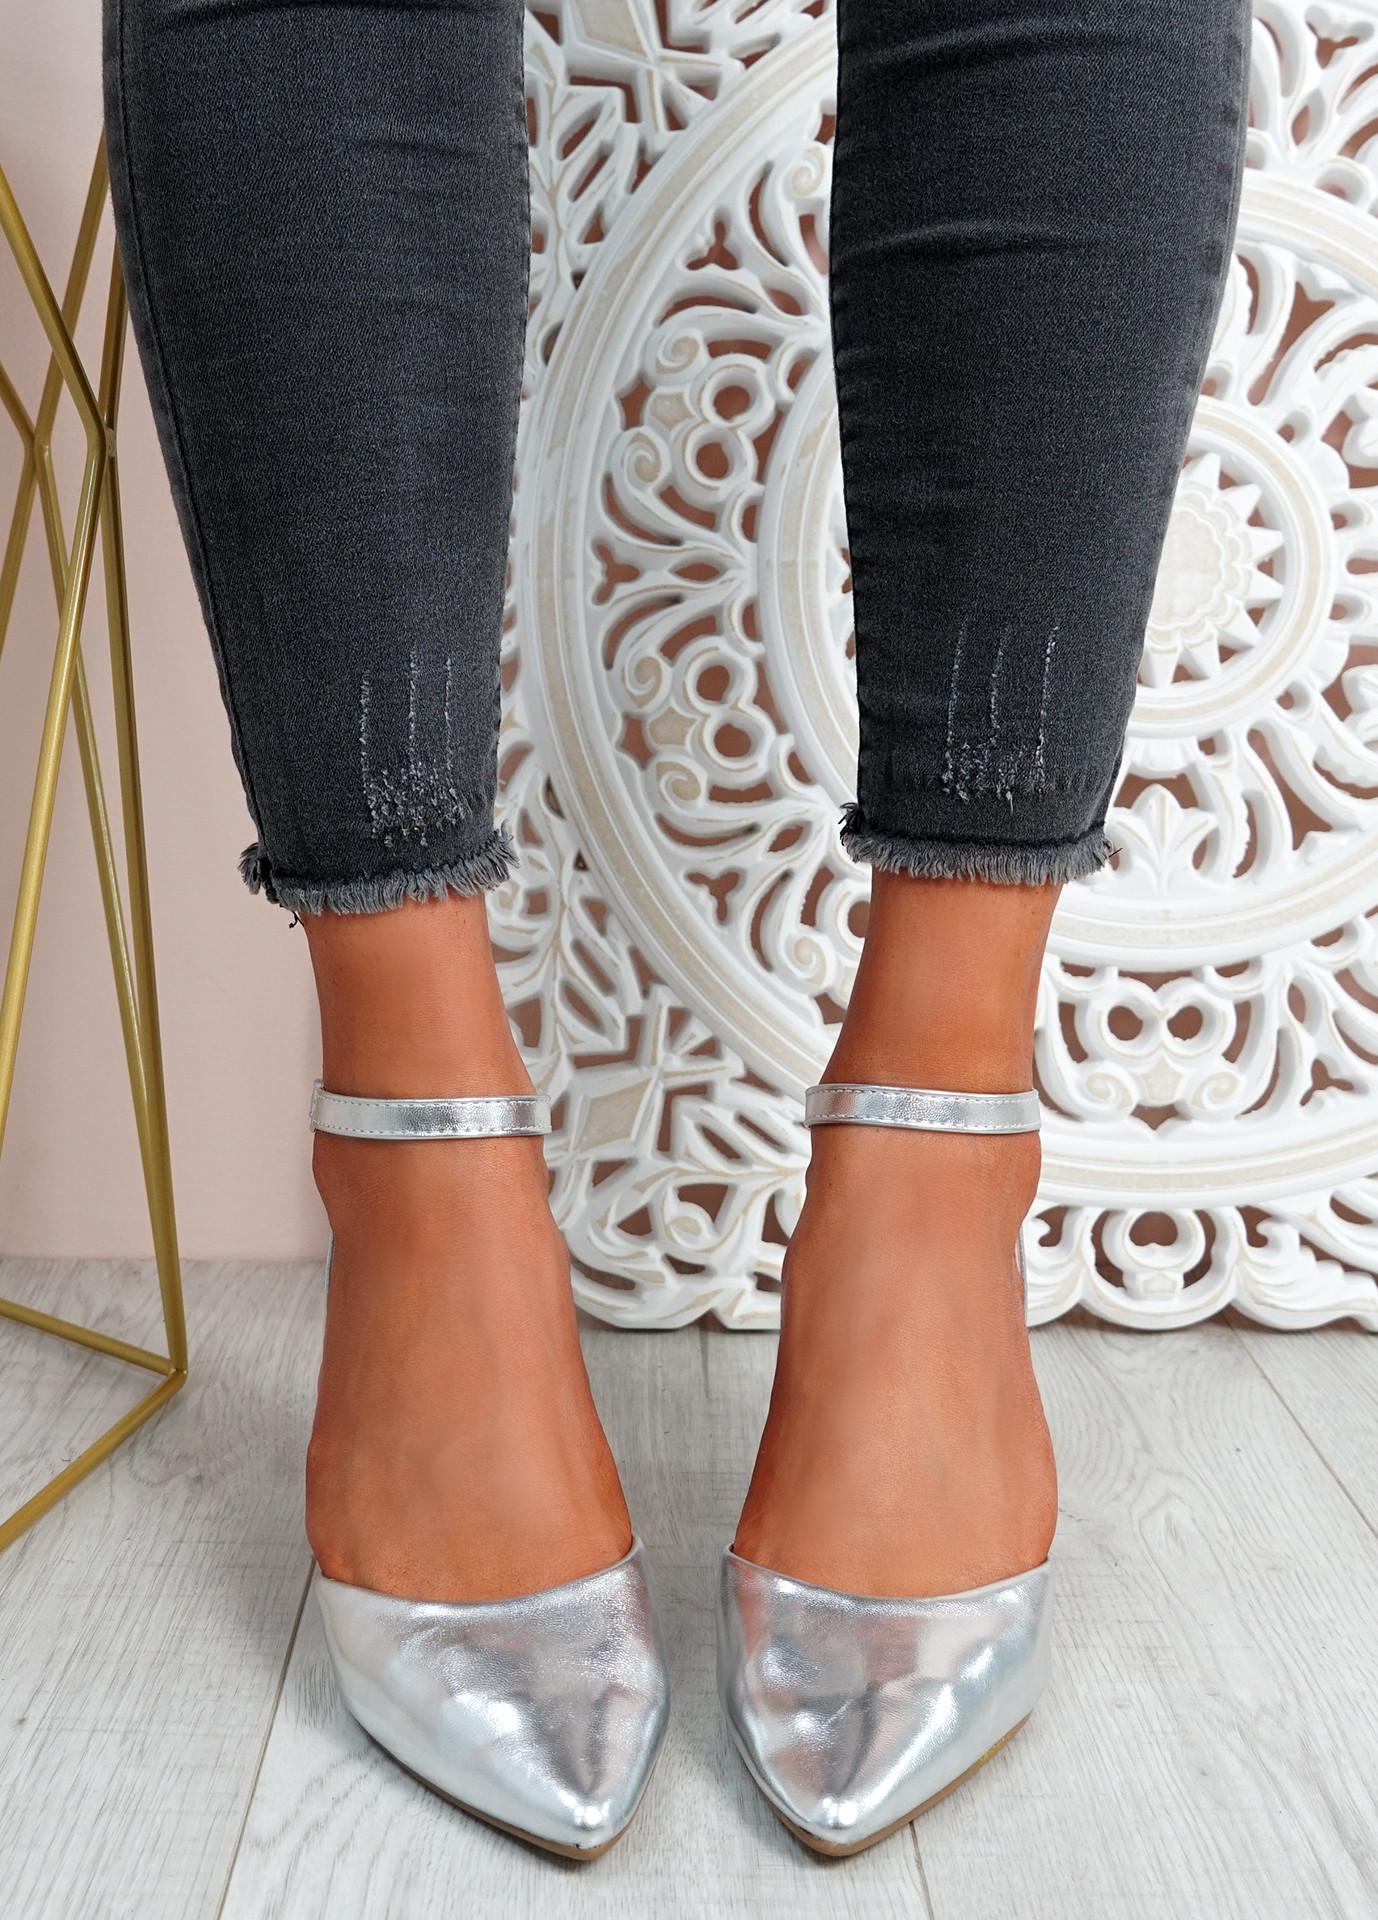 Mya Silver Block Heel Ankle Strap Pumps